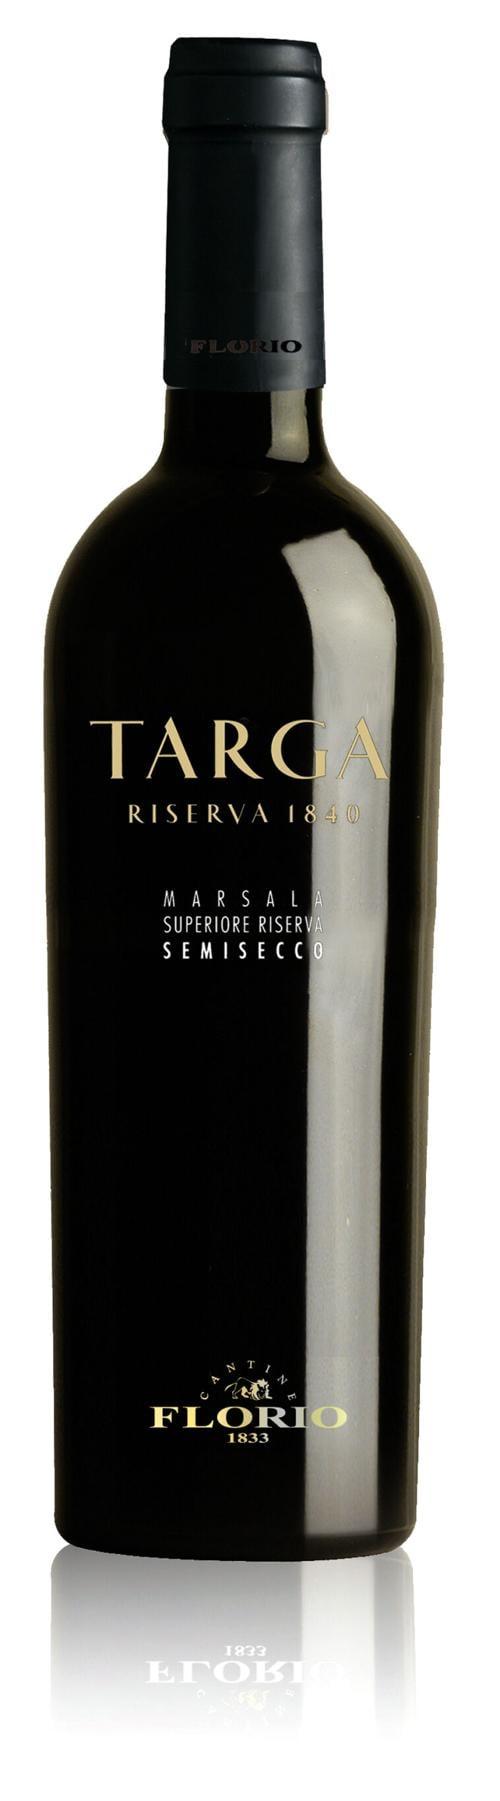 Targa Riserva